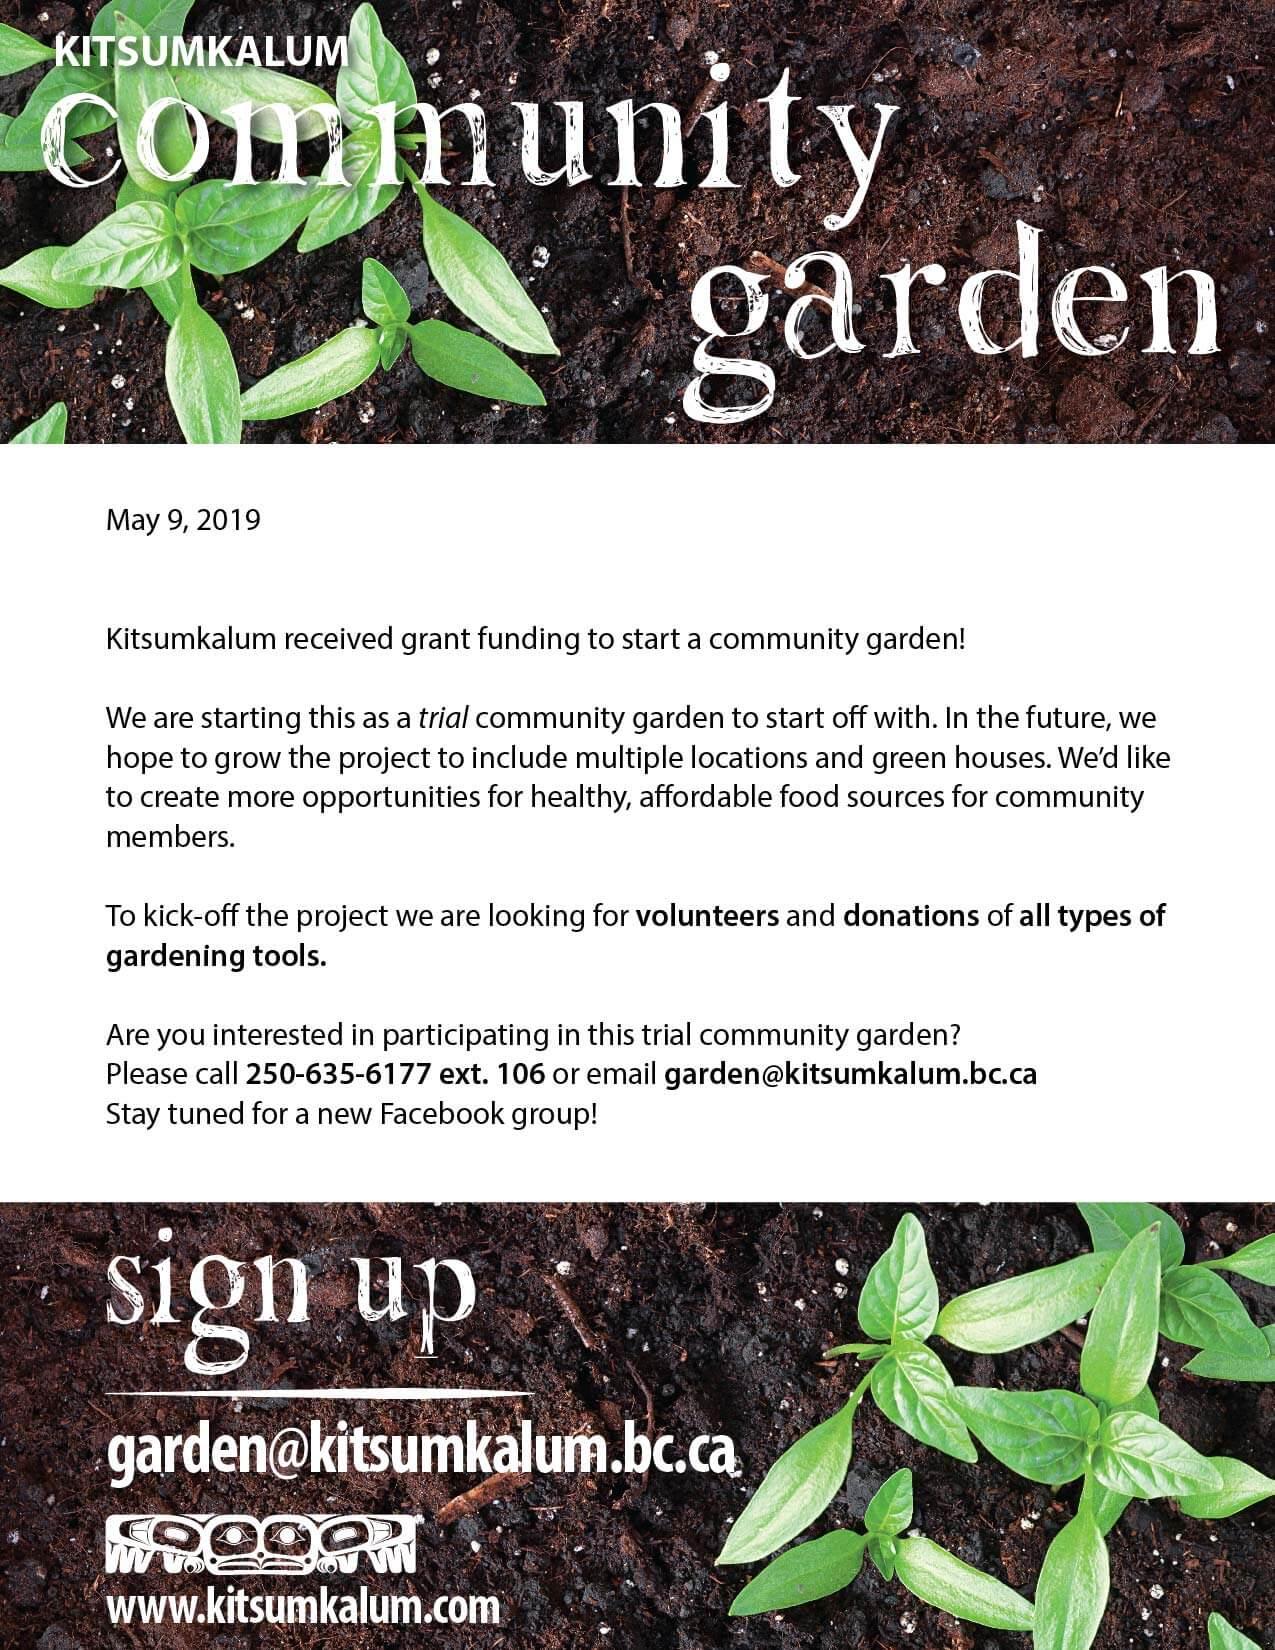 Kitsumkalum Community Garden